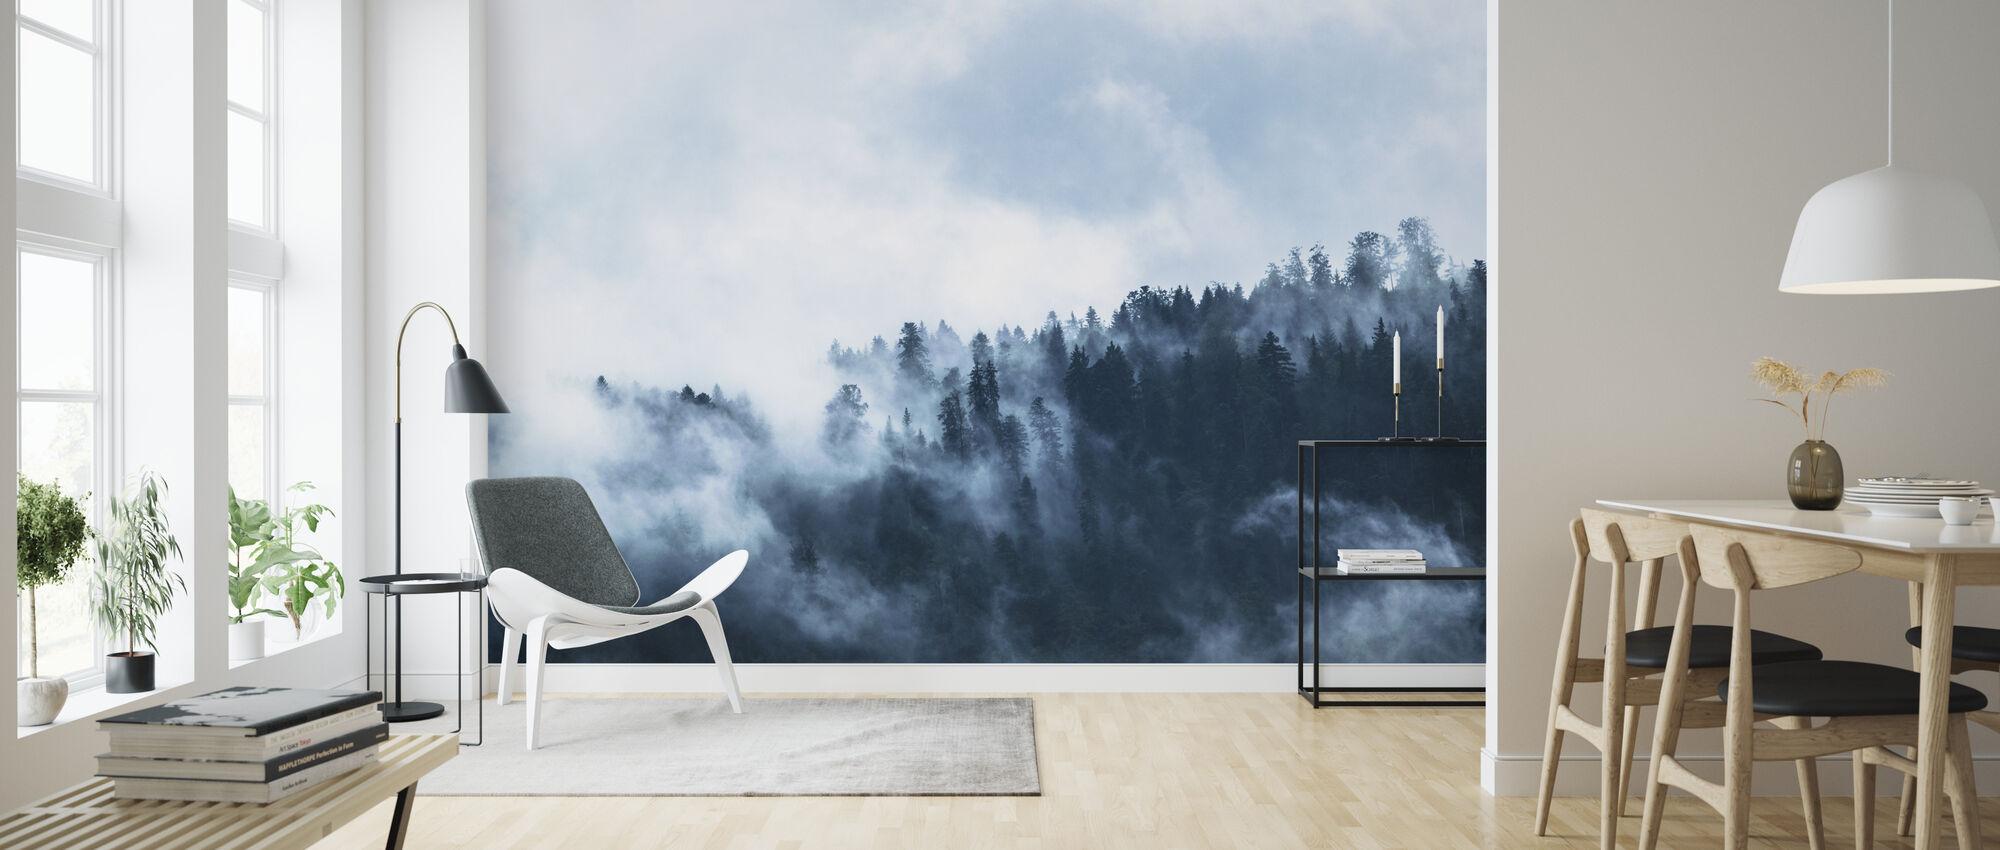 Fog in the Forest - Wallpaper - Living Room